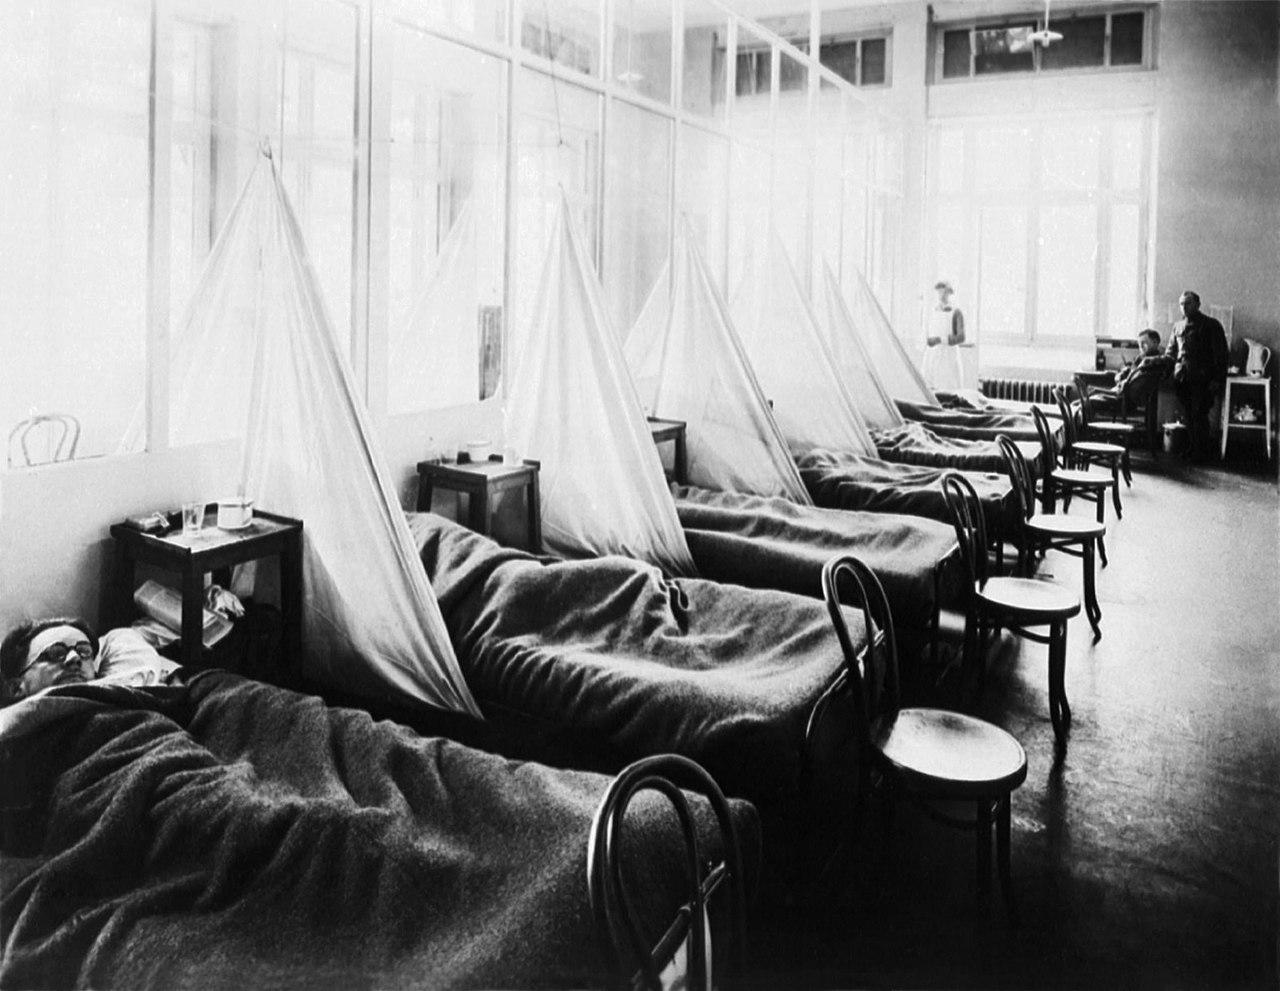 """U.S. Army Camp Hospital No. 45, Aix-Les-Bains, France, Influenza Ward No. 1. Influenza pandemic ward during World War I. Circa 1918."" (Bild: U.S. Army Medical Corps photo via National Museum of Health & Medicine website, Wikipedia)"